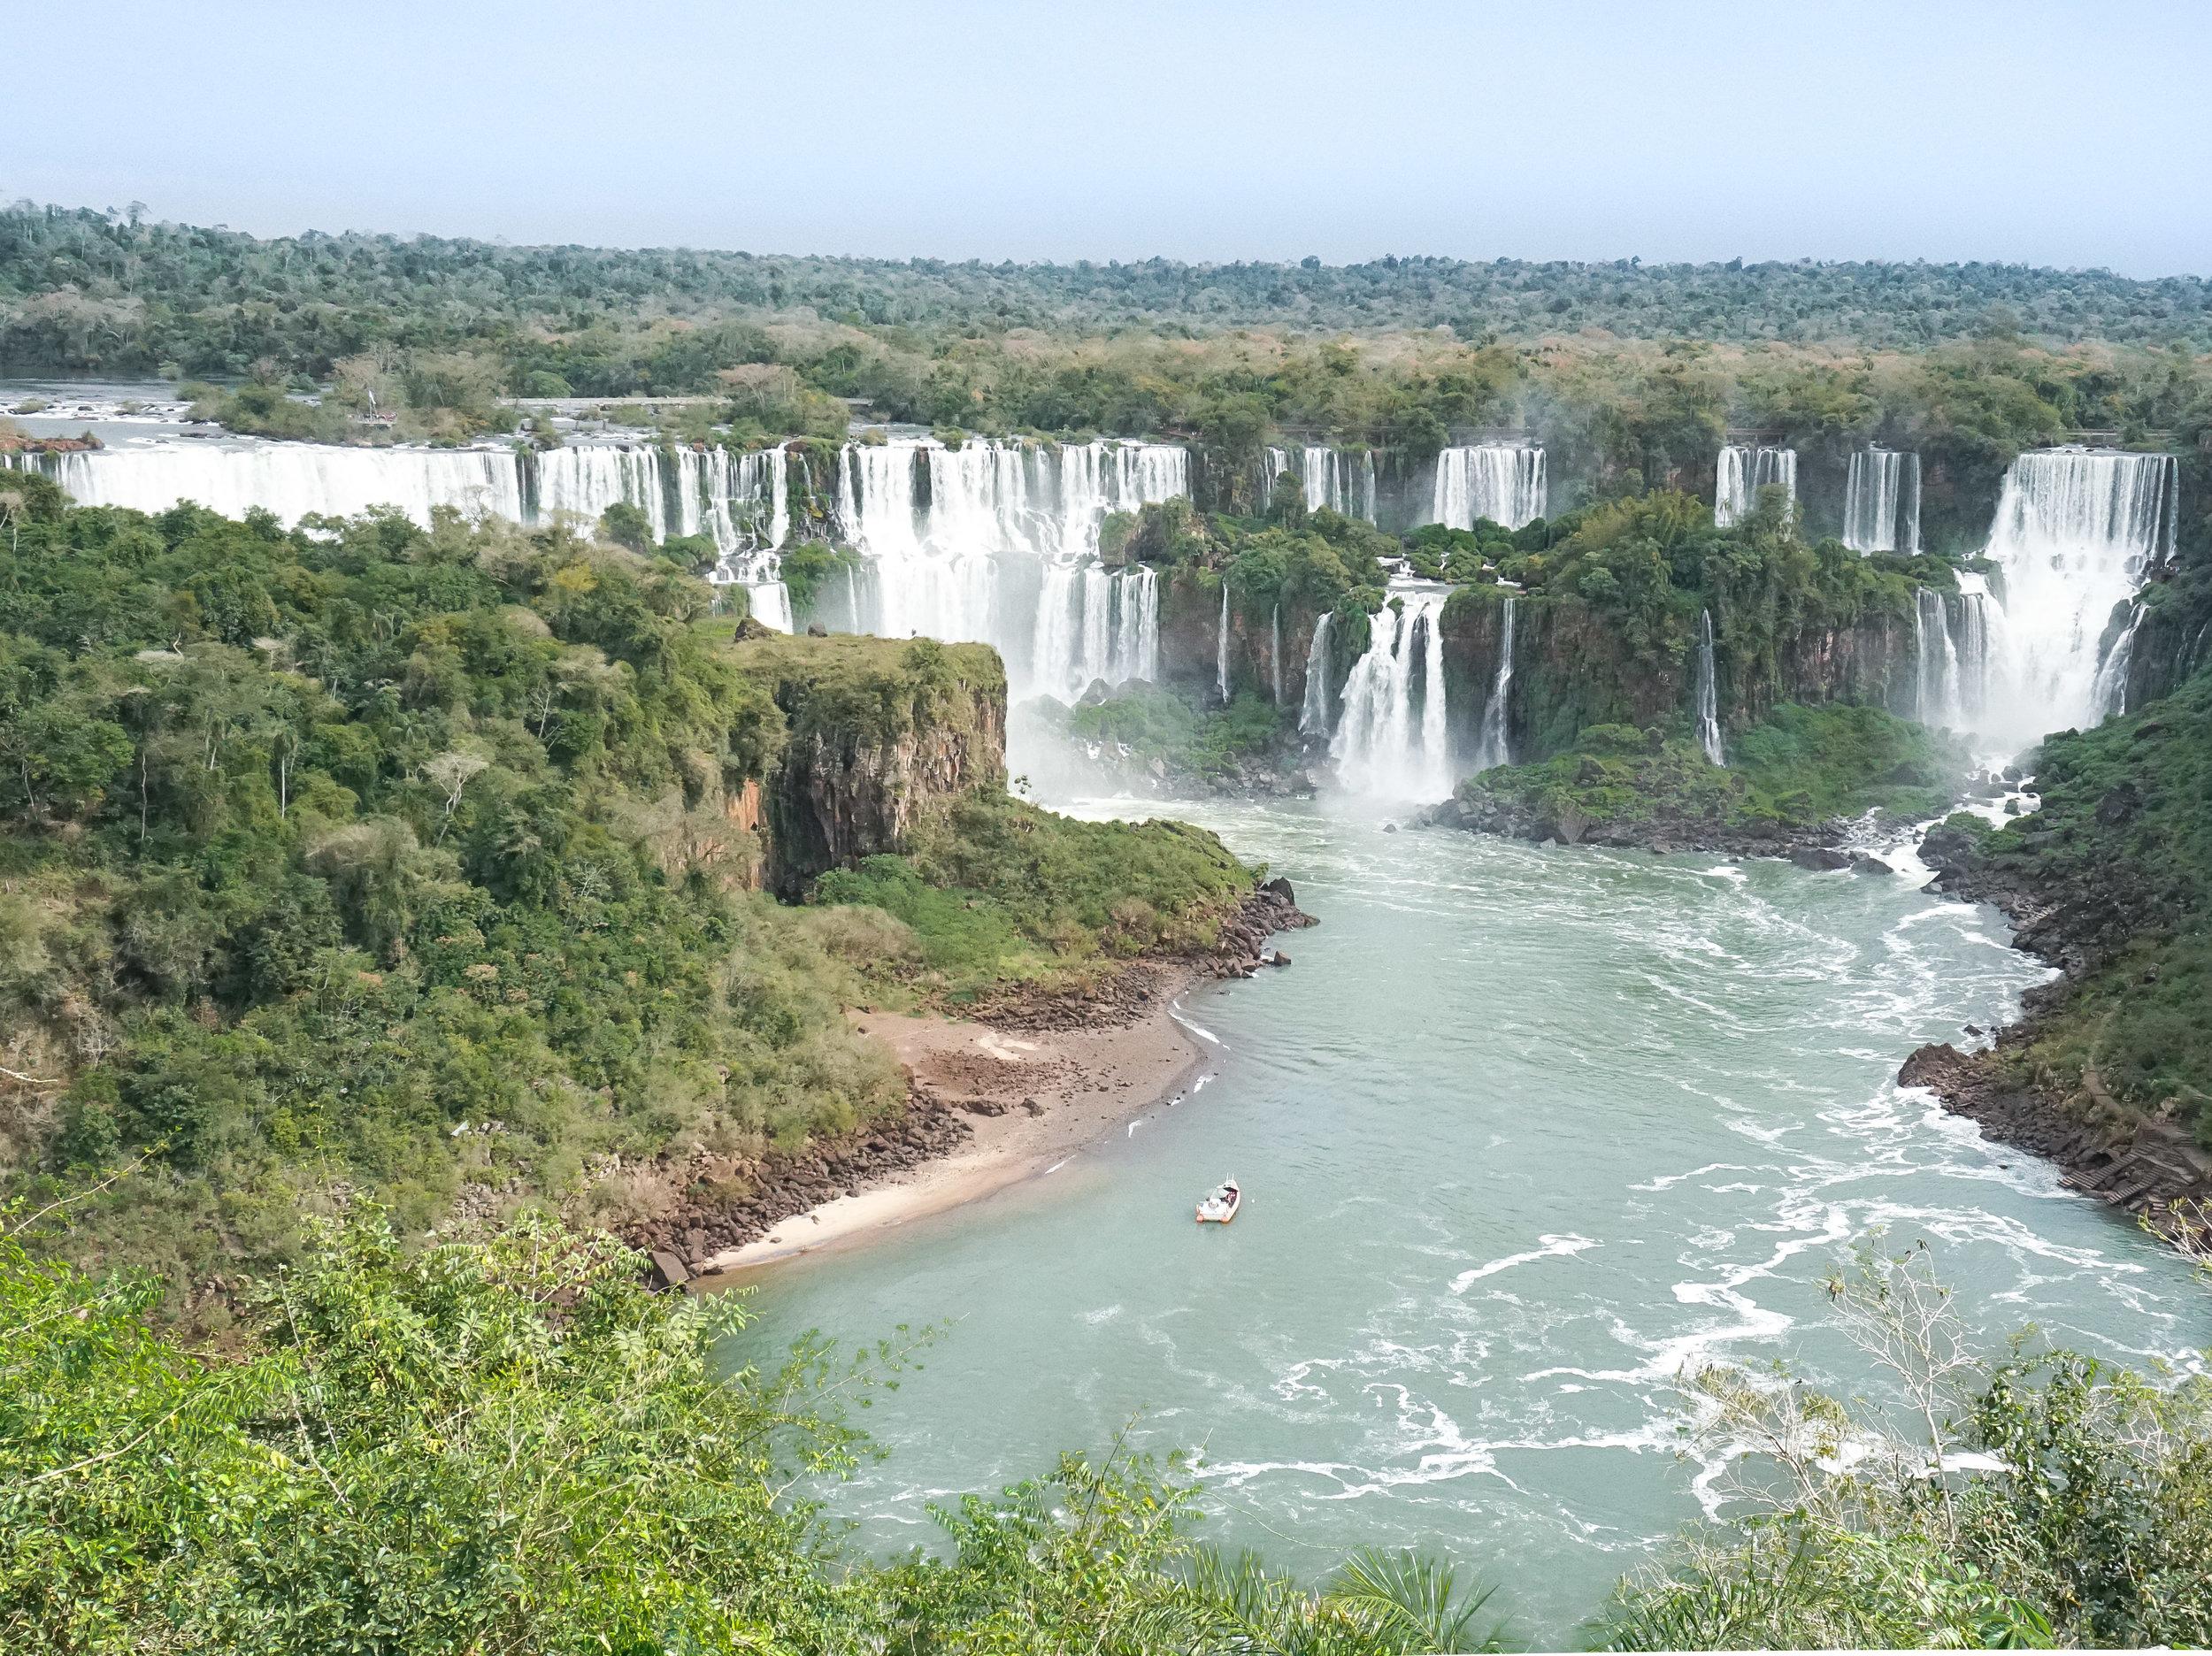 curio.trips.brazil.iguassu.falls.waterfall.view.landscape-2.jpg